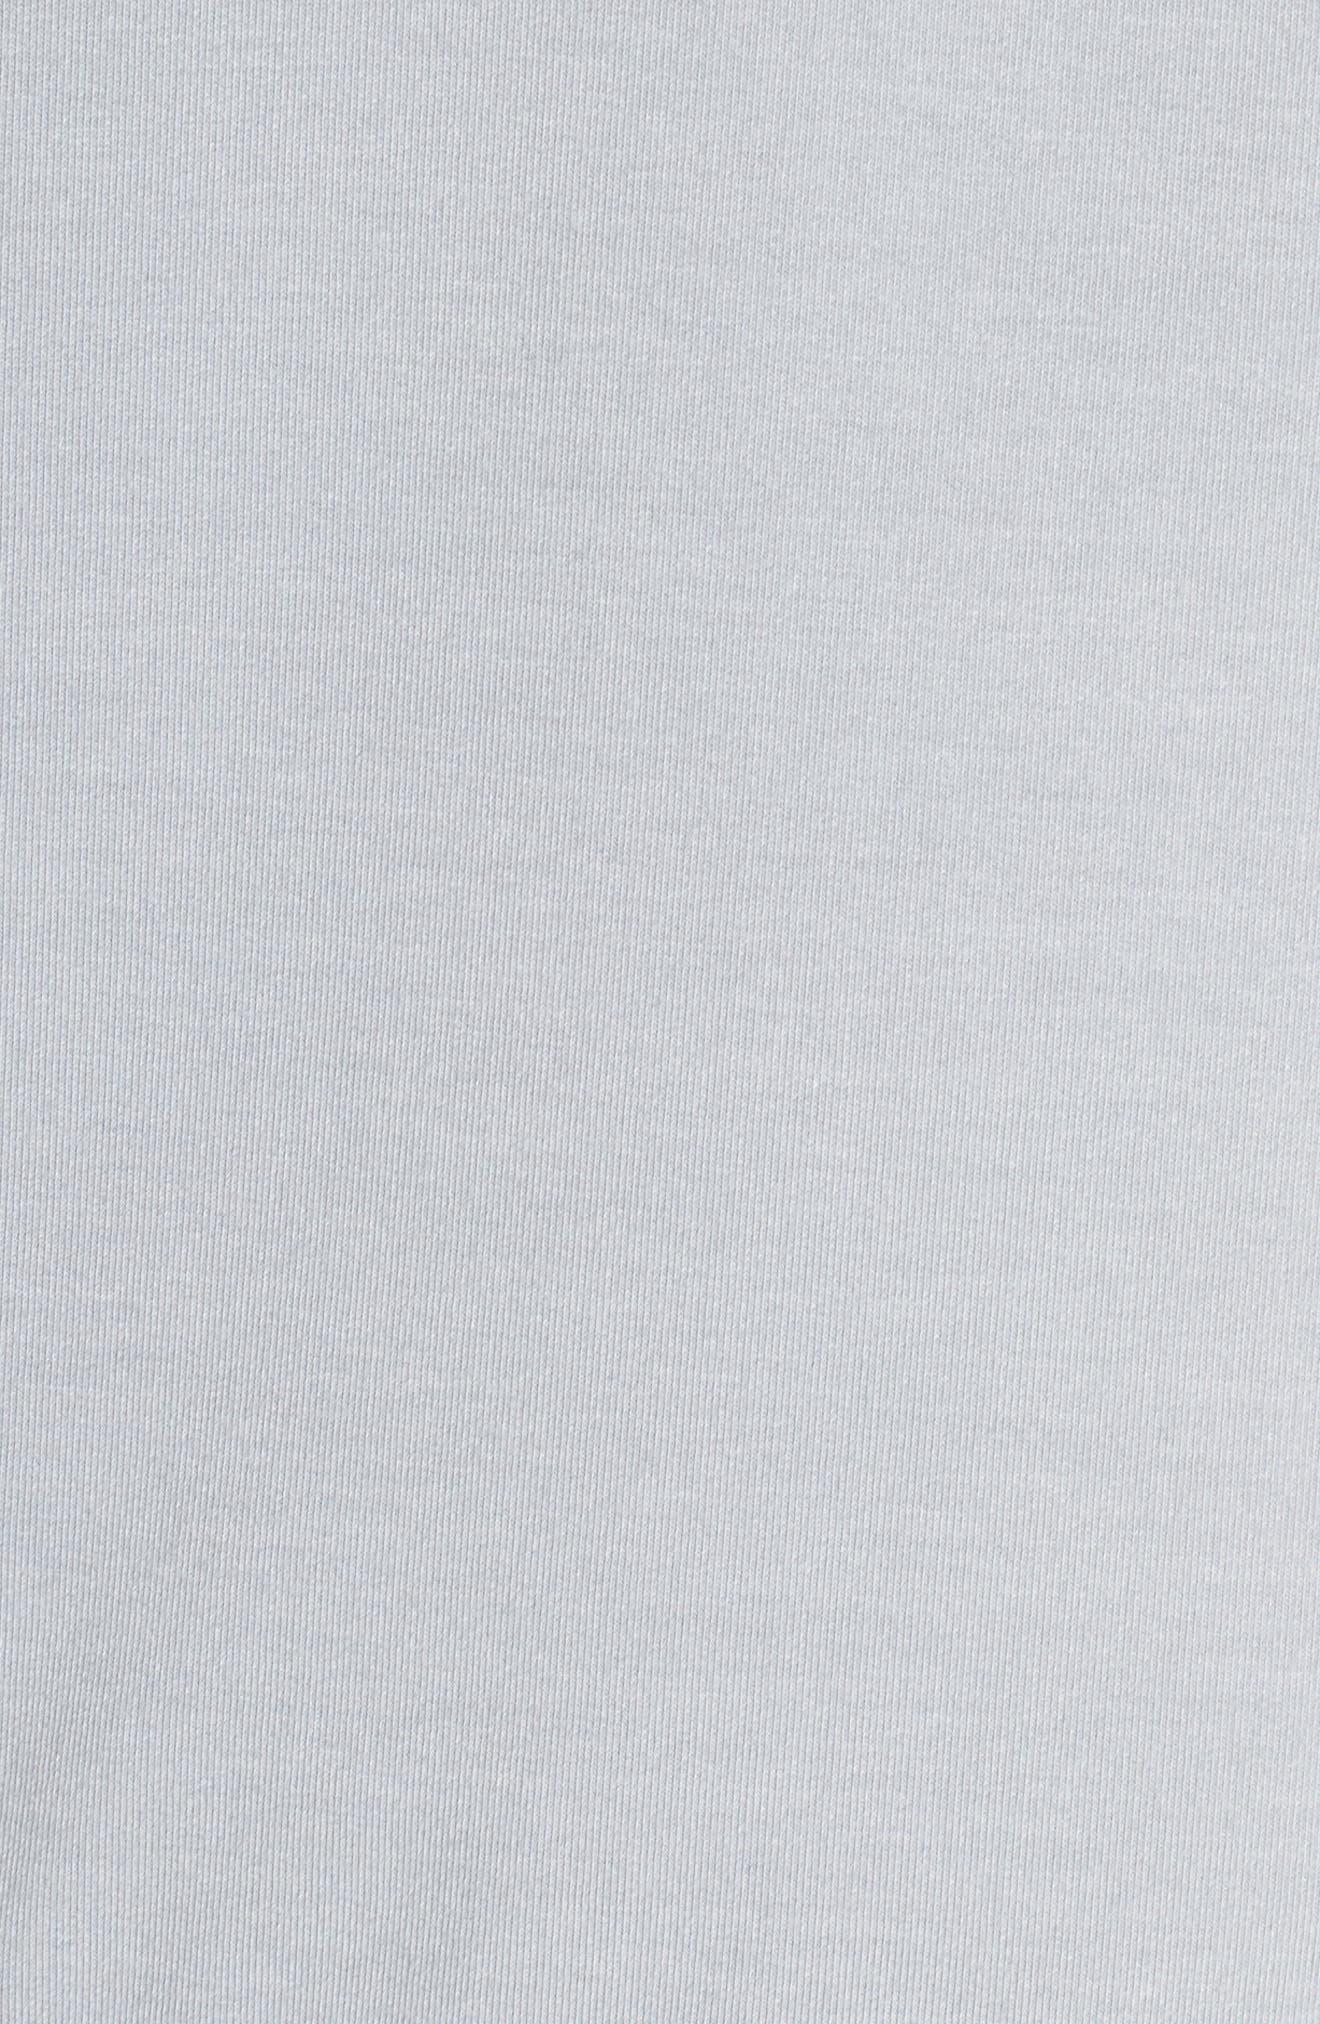 Gather Sleeve Sweatshirt,                             Alternate thumbnail 6, color,                             GREY WOLF